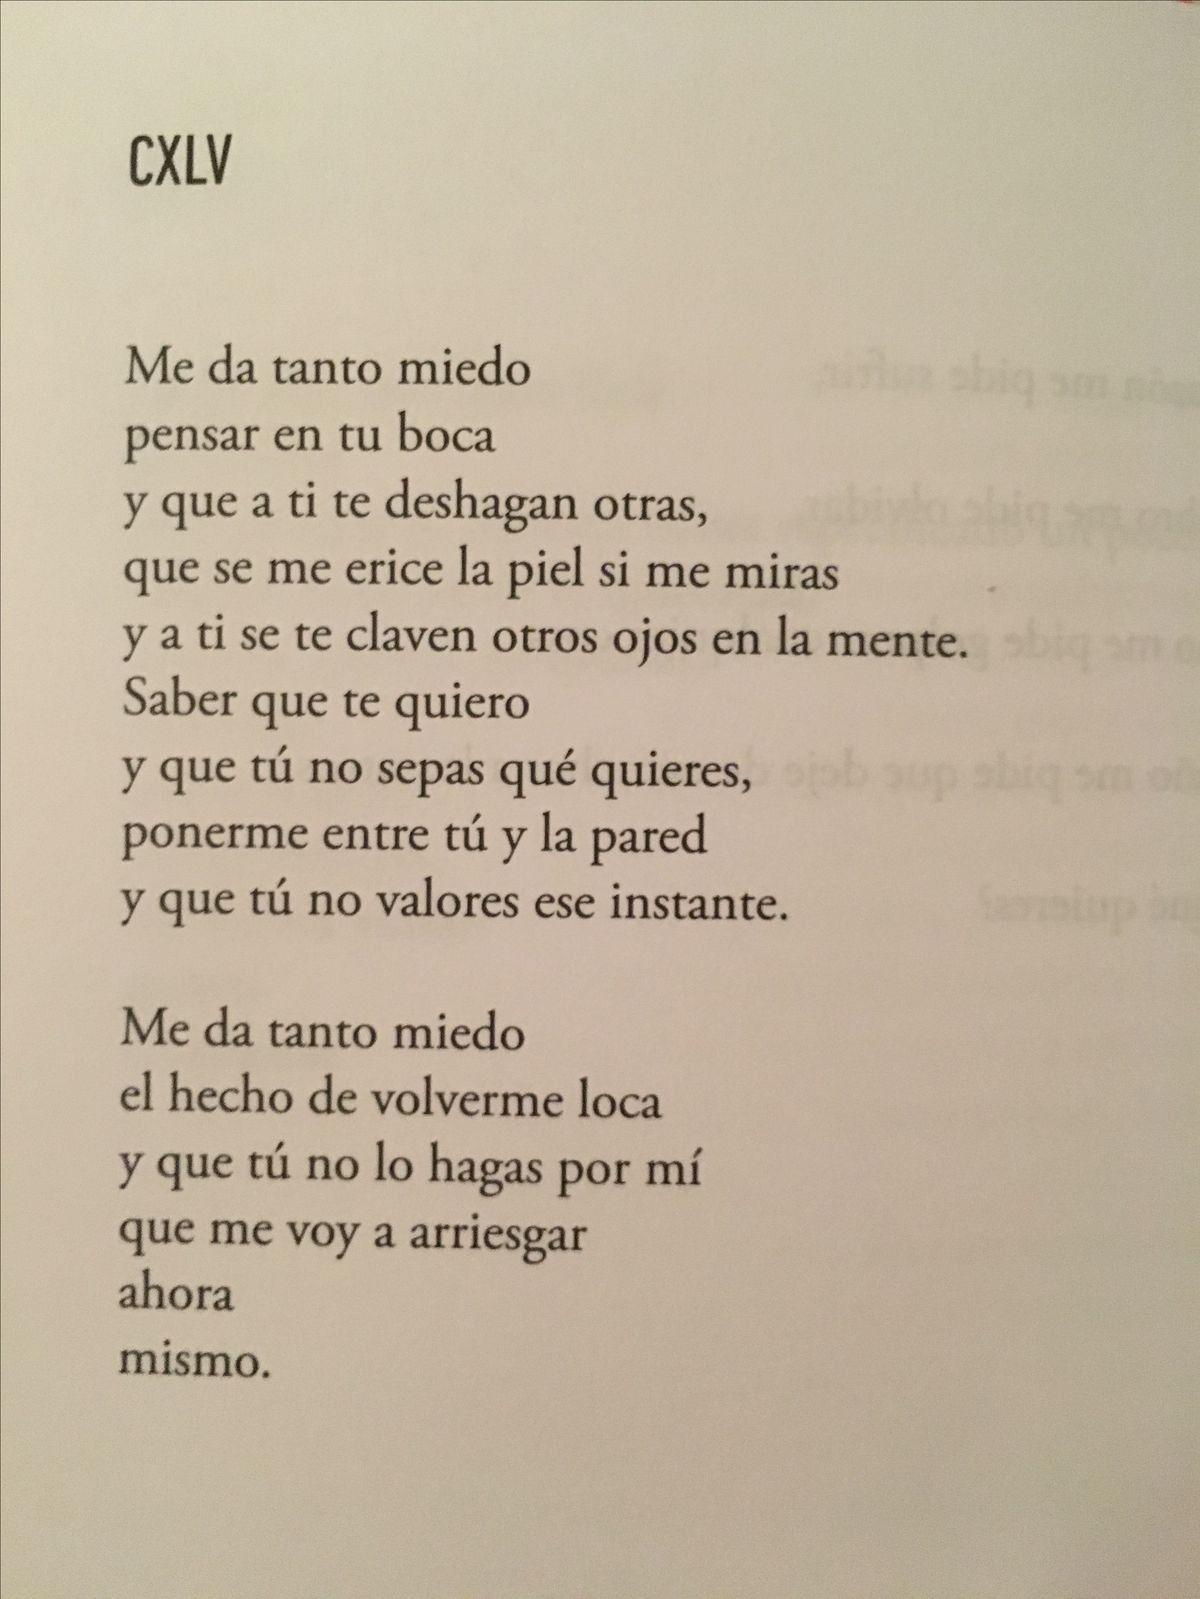 Aún Con Miedo Frases Amor Y Asco Frases Amor Y